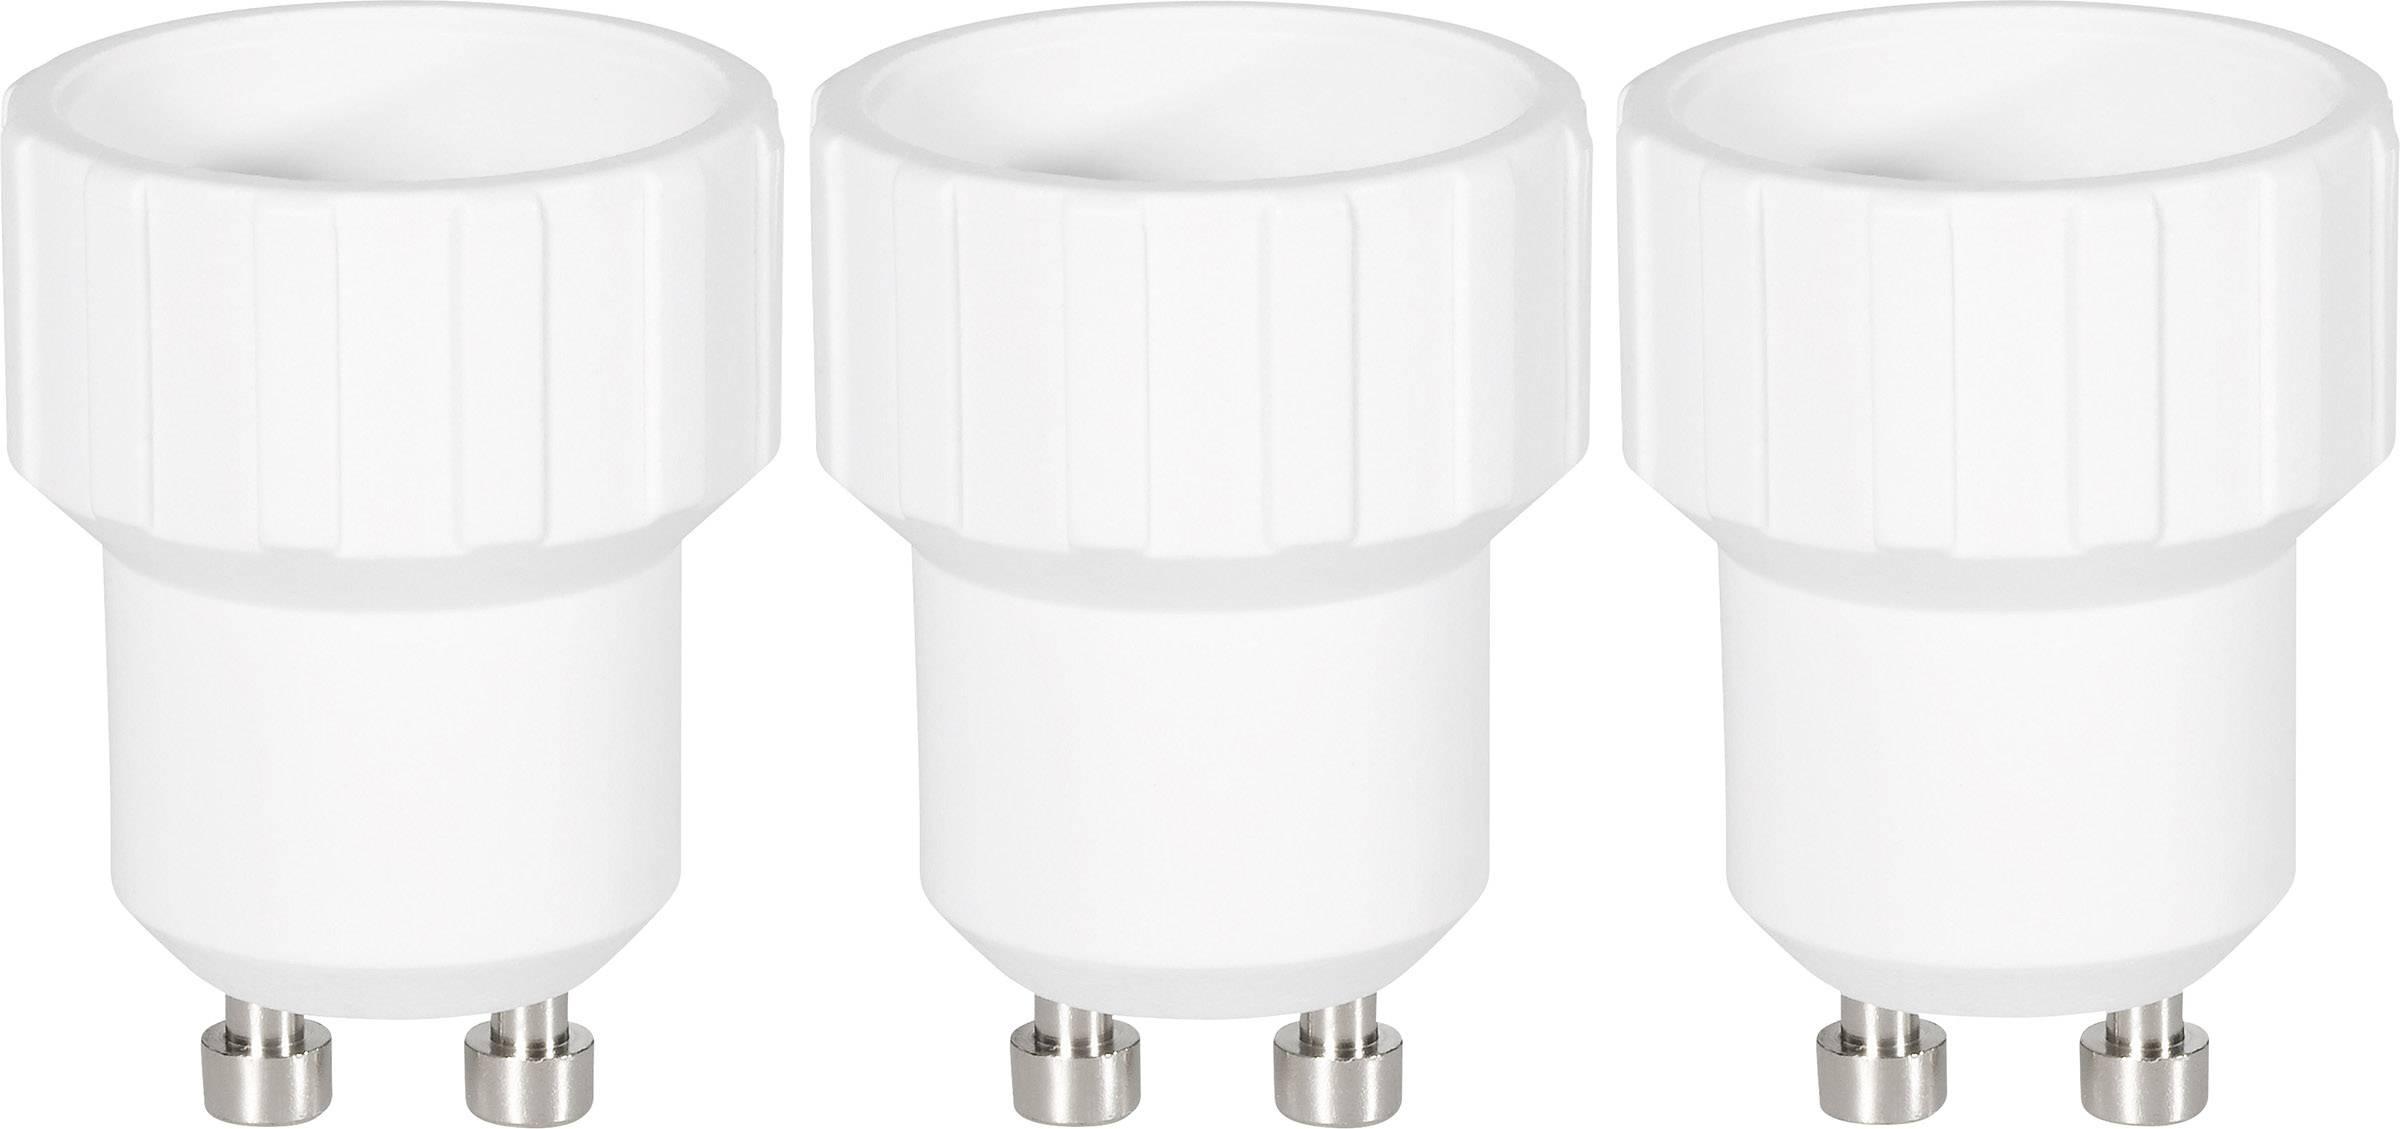 Redukcia Renkforce pre GU10 ⇔ E14, 97029c81f, 220 - 250 V, max. 75 W, biela